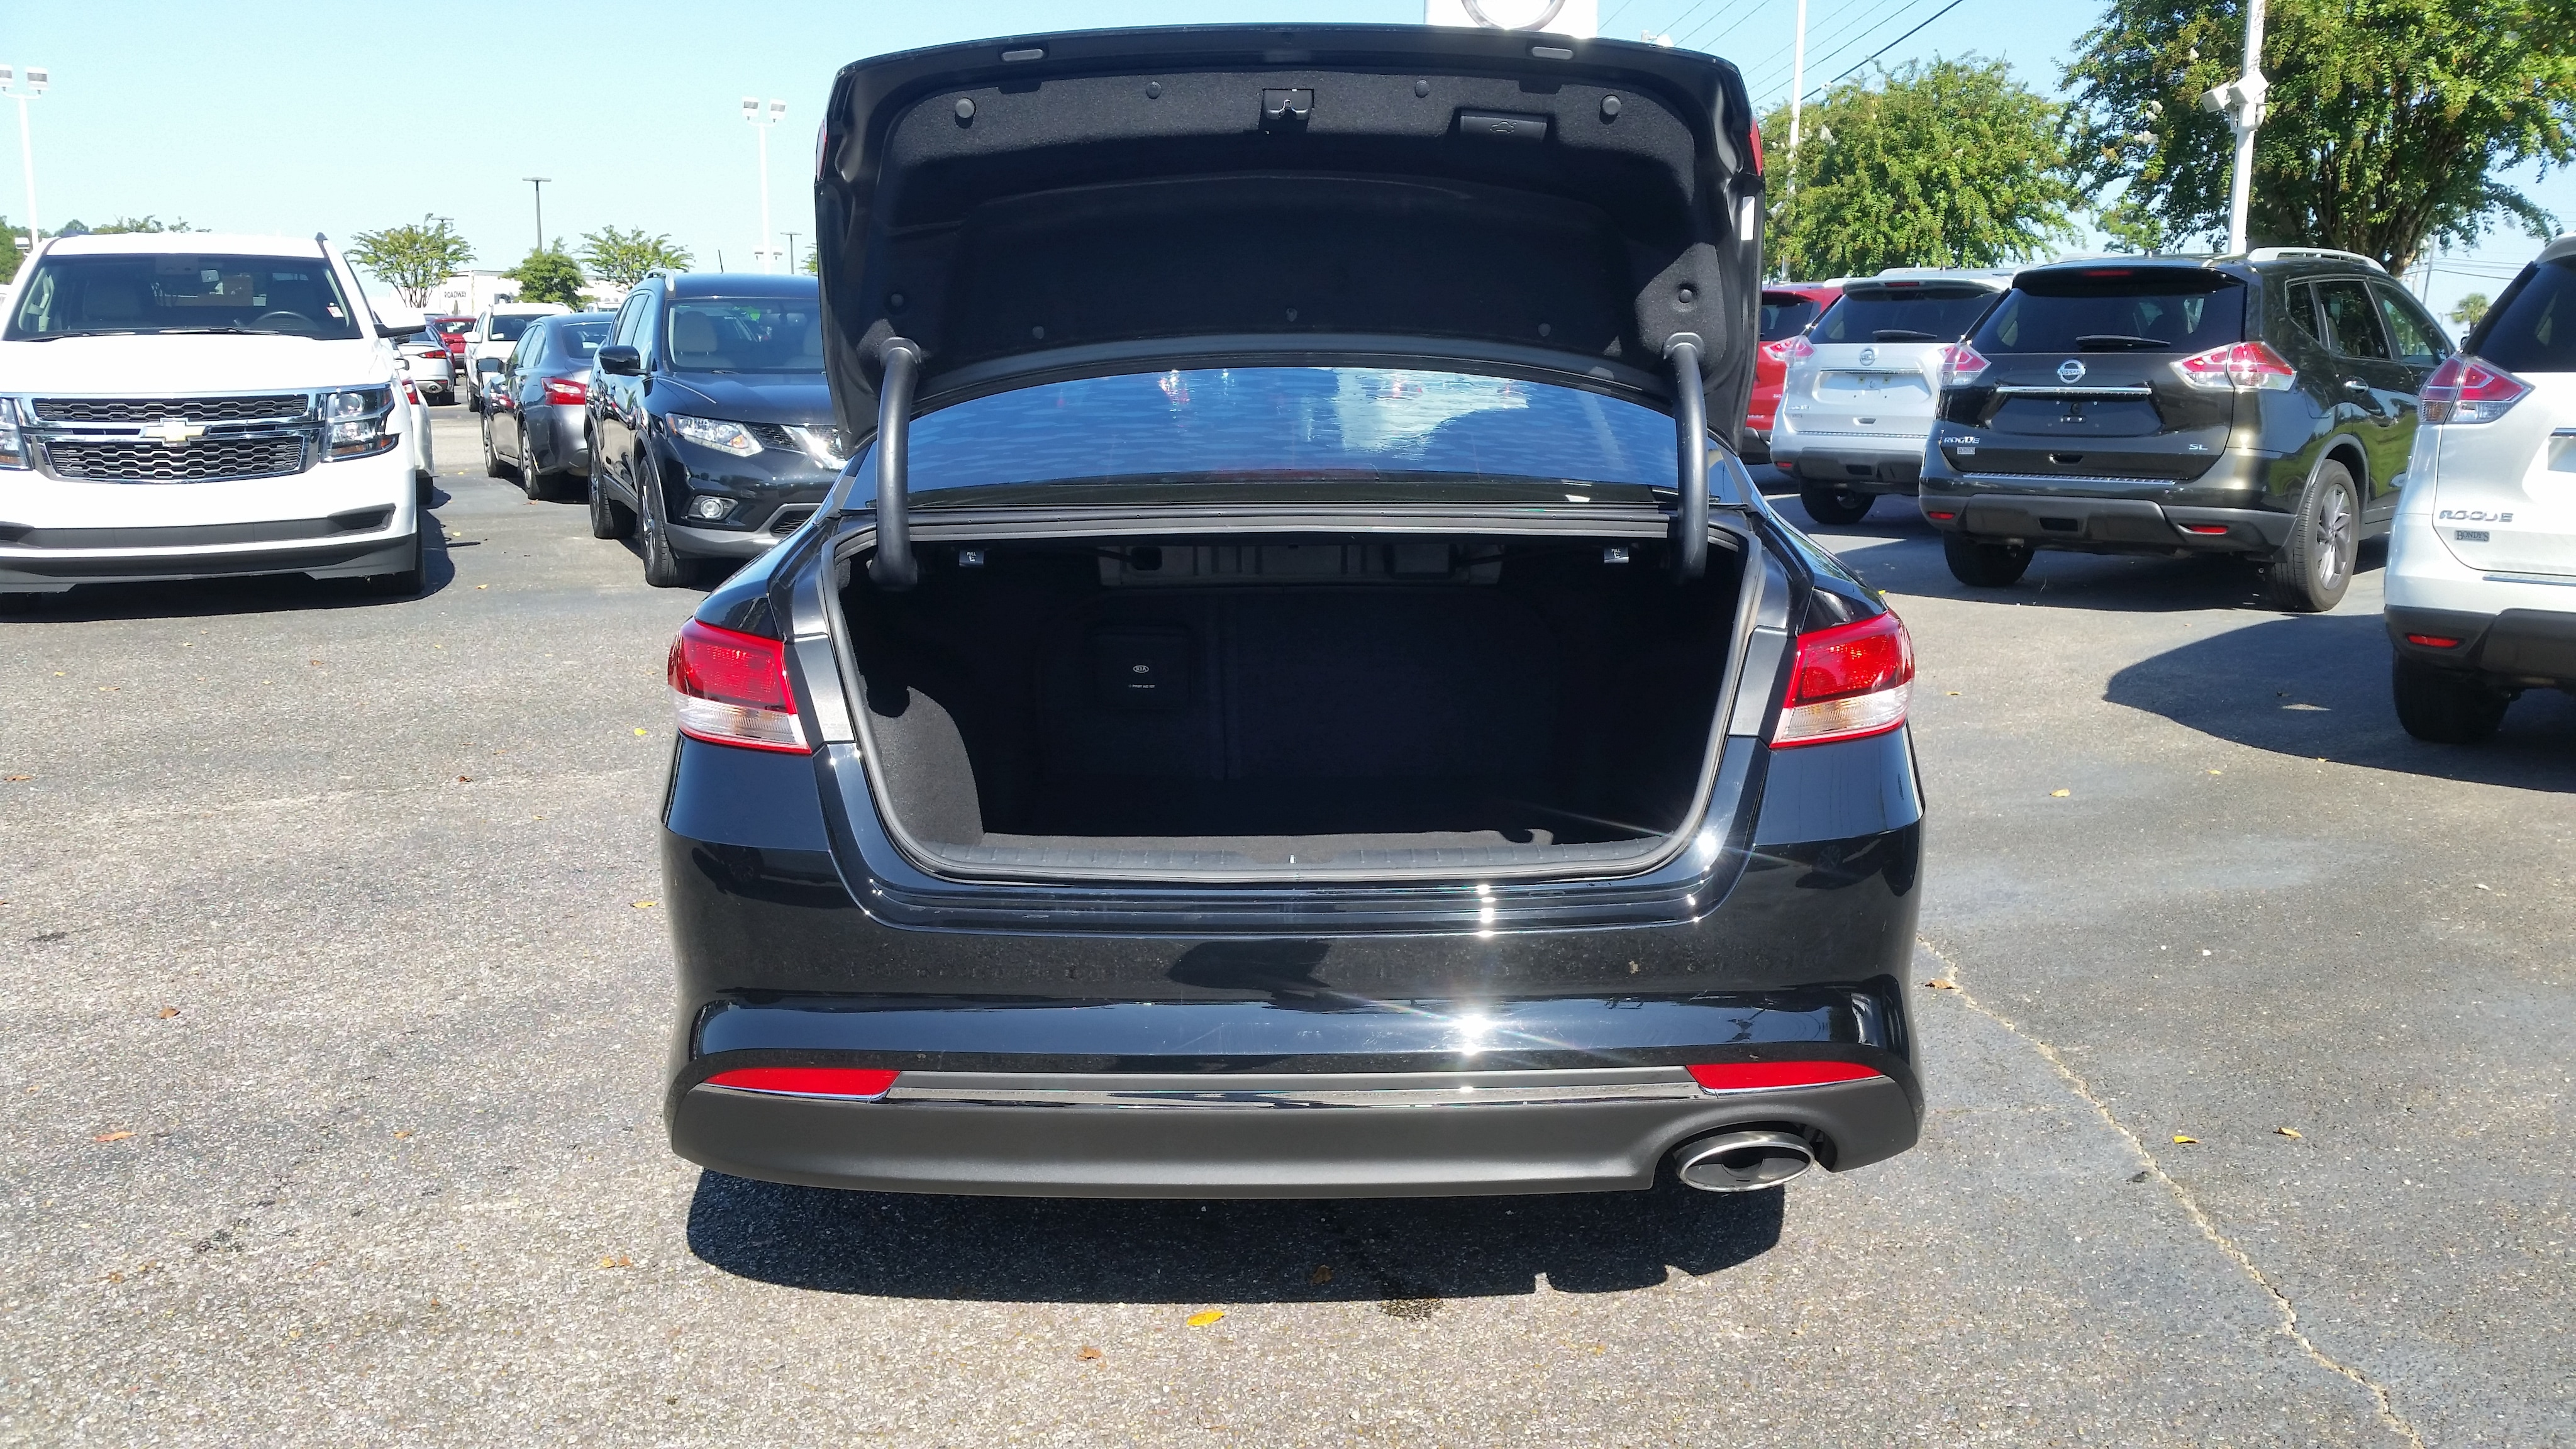 Used 2016 Kia Optima For Sale at Bondy's Nissan | VIN